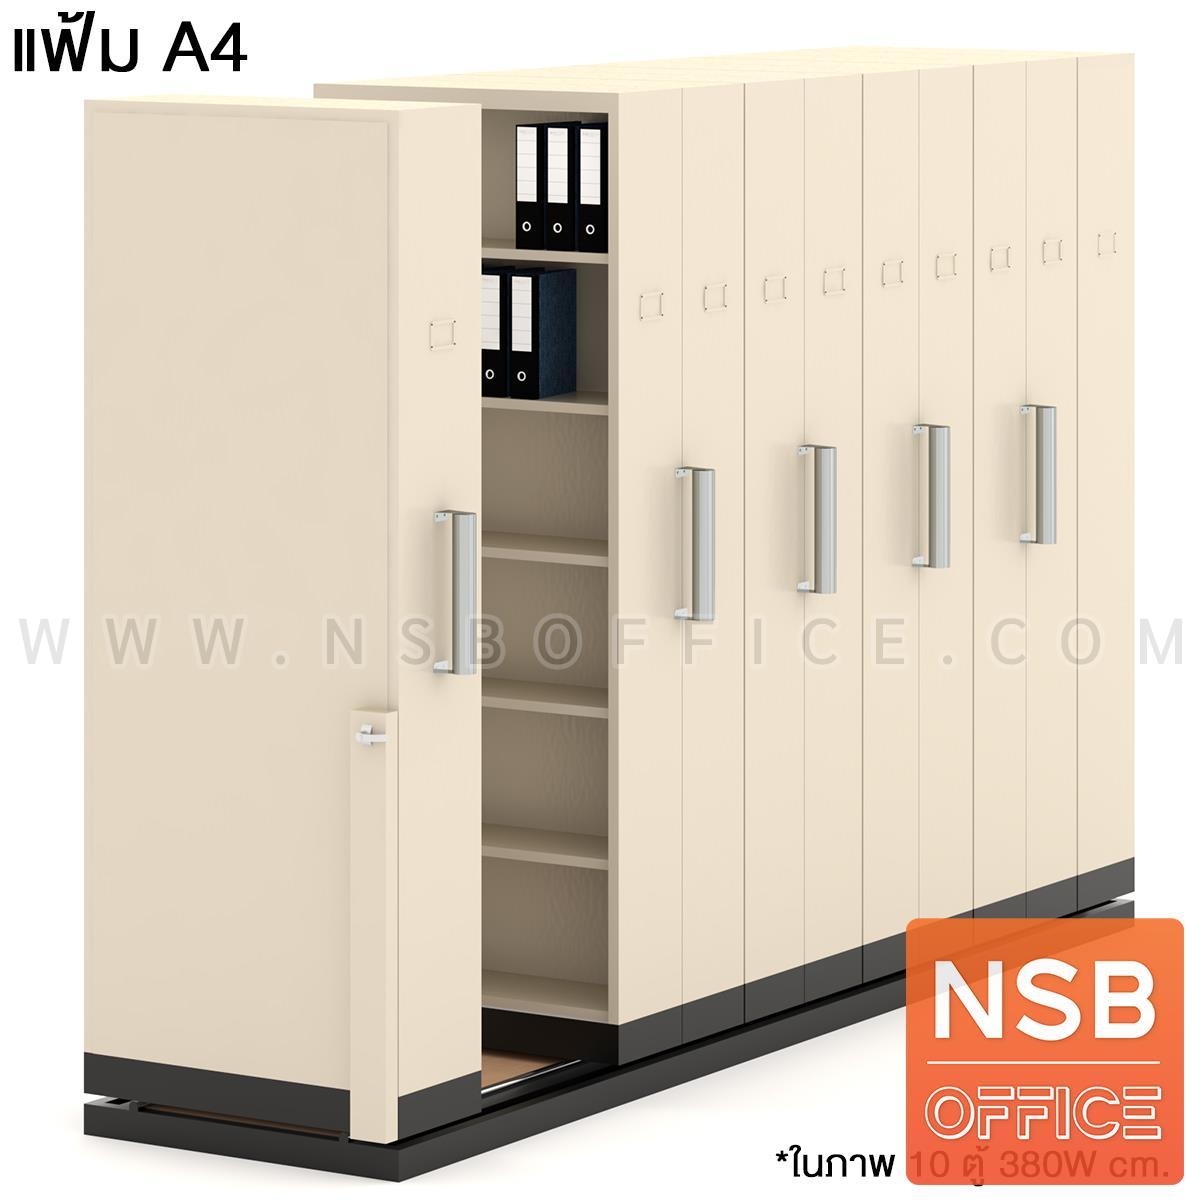 D02A023:ตู้รางเลื่อนแบบมือผลัก   91.4D cm ขนาด 4, 6, 8, 10, 12, 14, 16 ตู้ สำหรับแฟ้ม A4